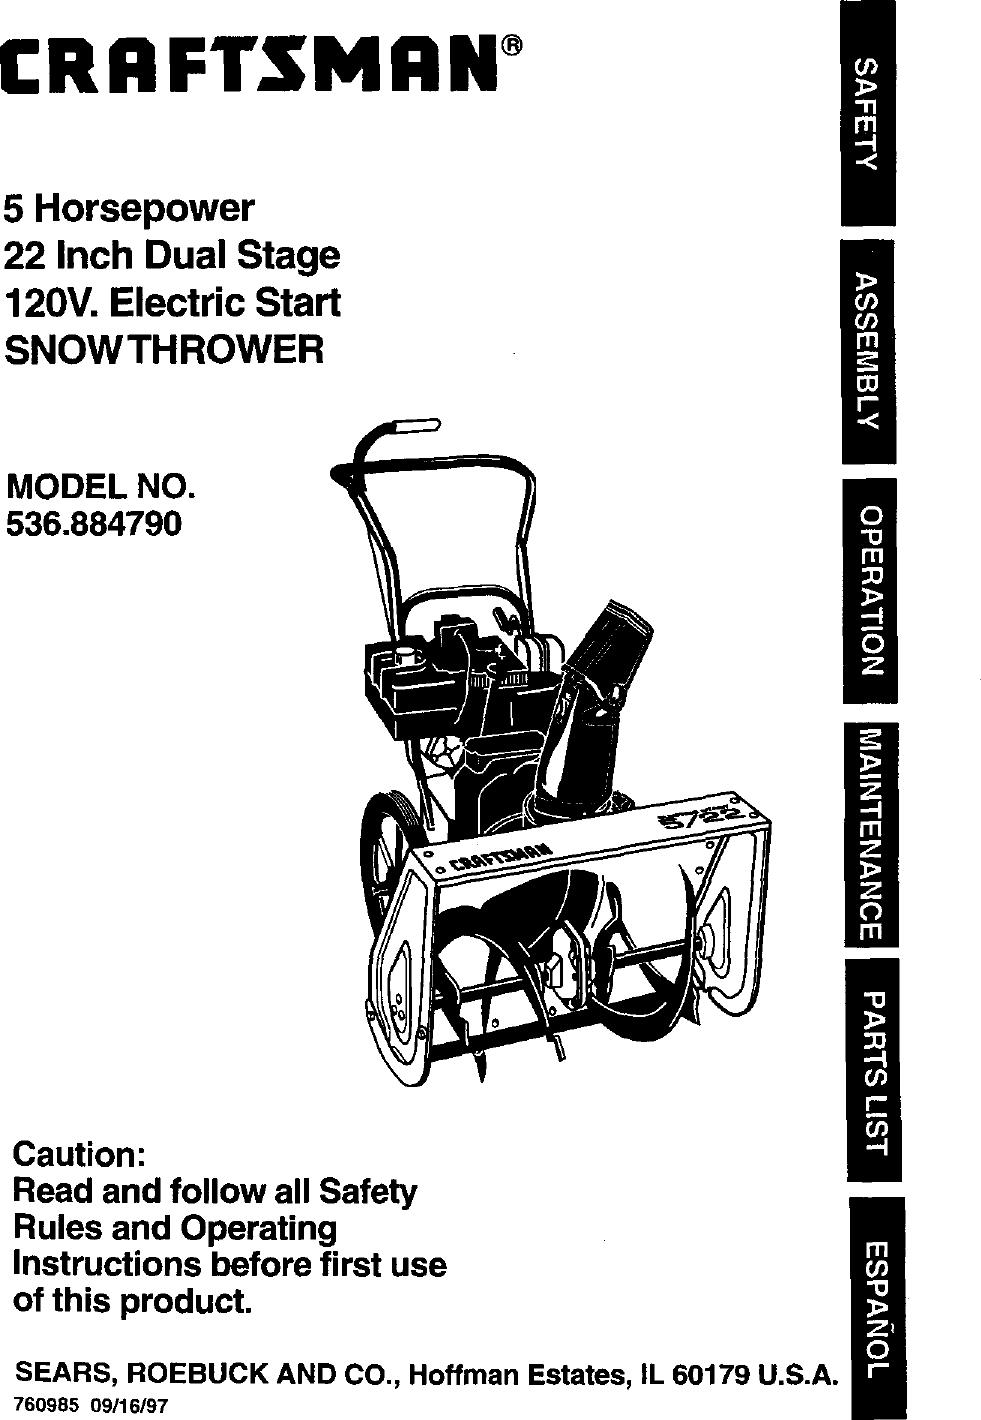 Craftsman 536884790 User Manual 5 HP SNOW THROWER Manuals